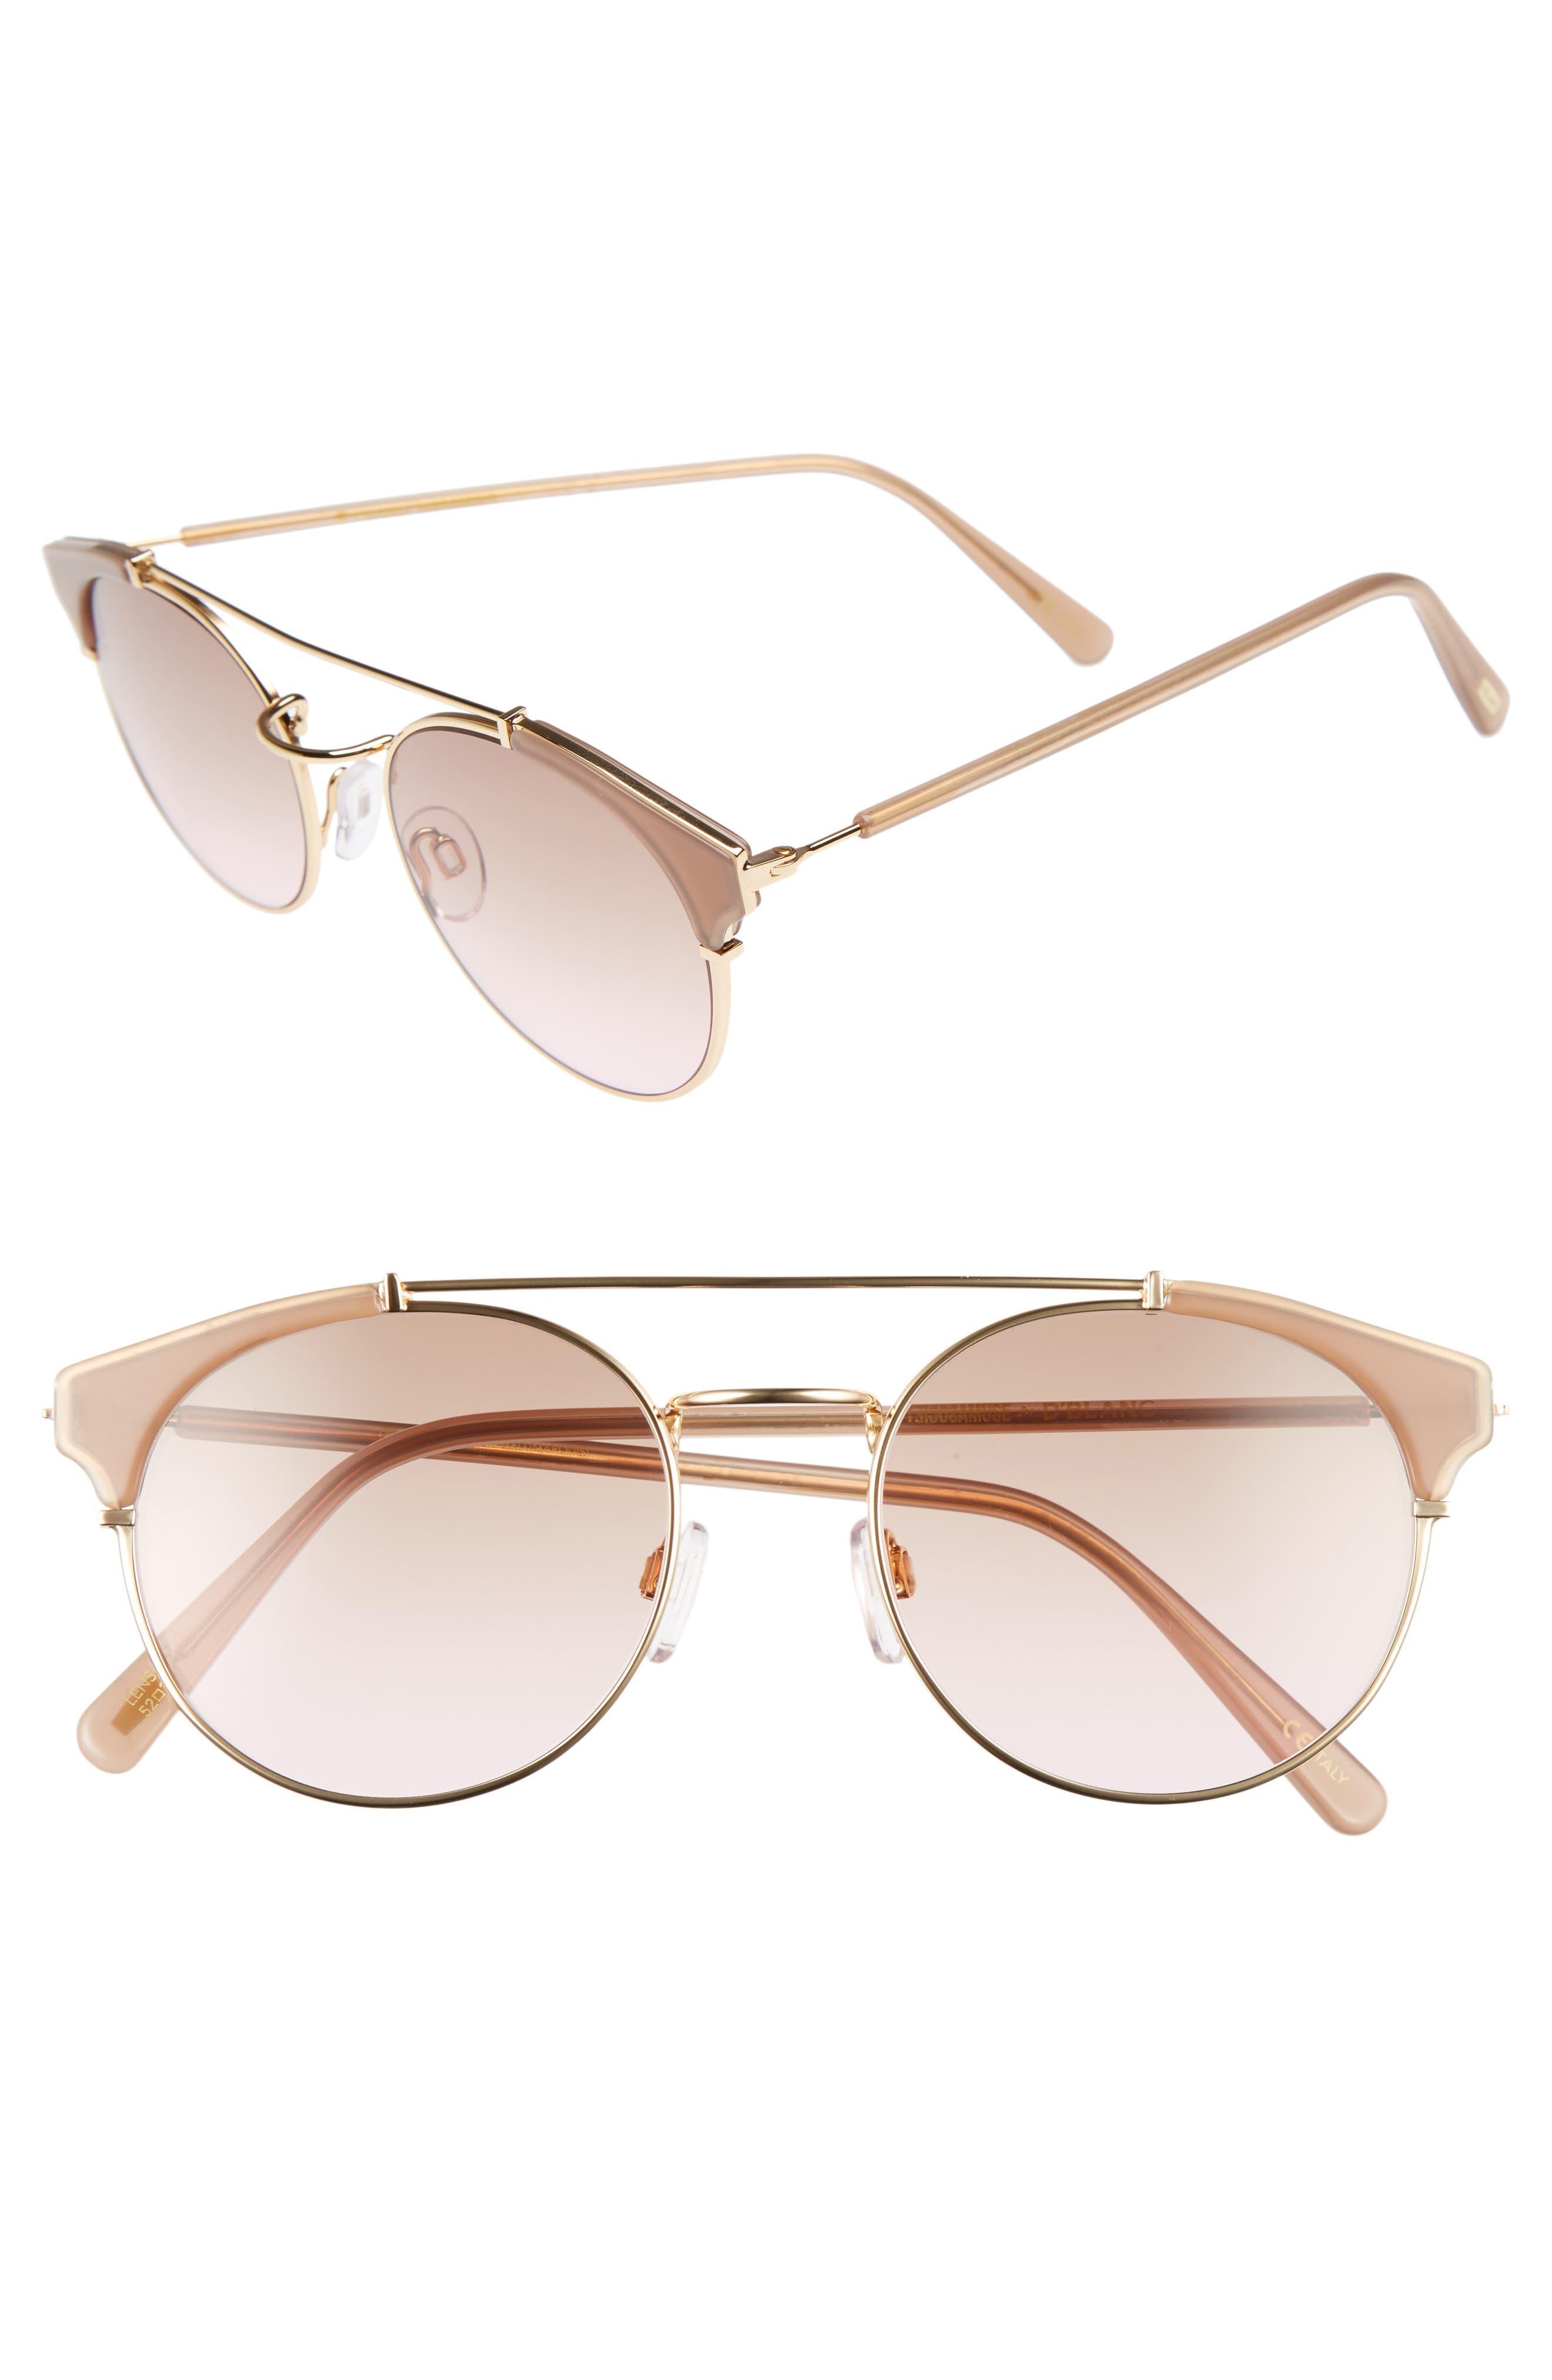 D'BLANC x Amuse Society Dosed Marquis 52mm Gradient Round Aviator Sunglasses